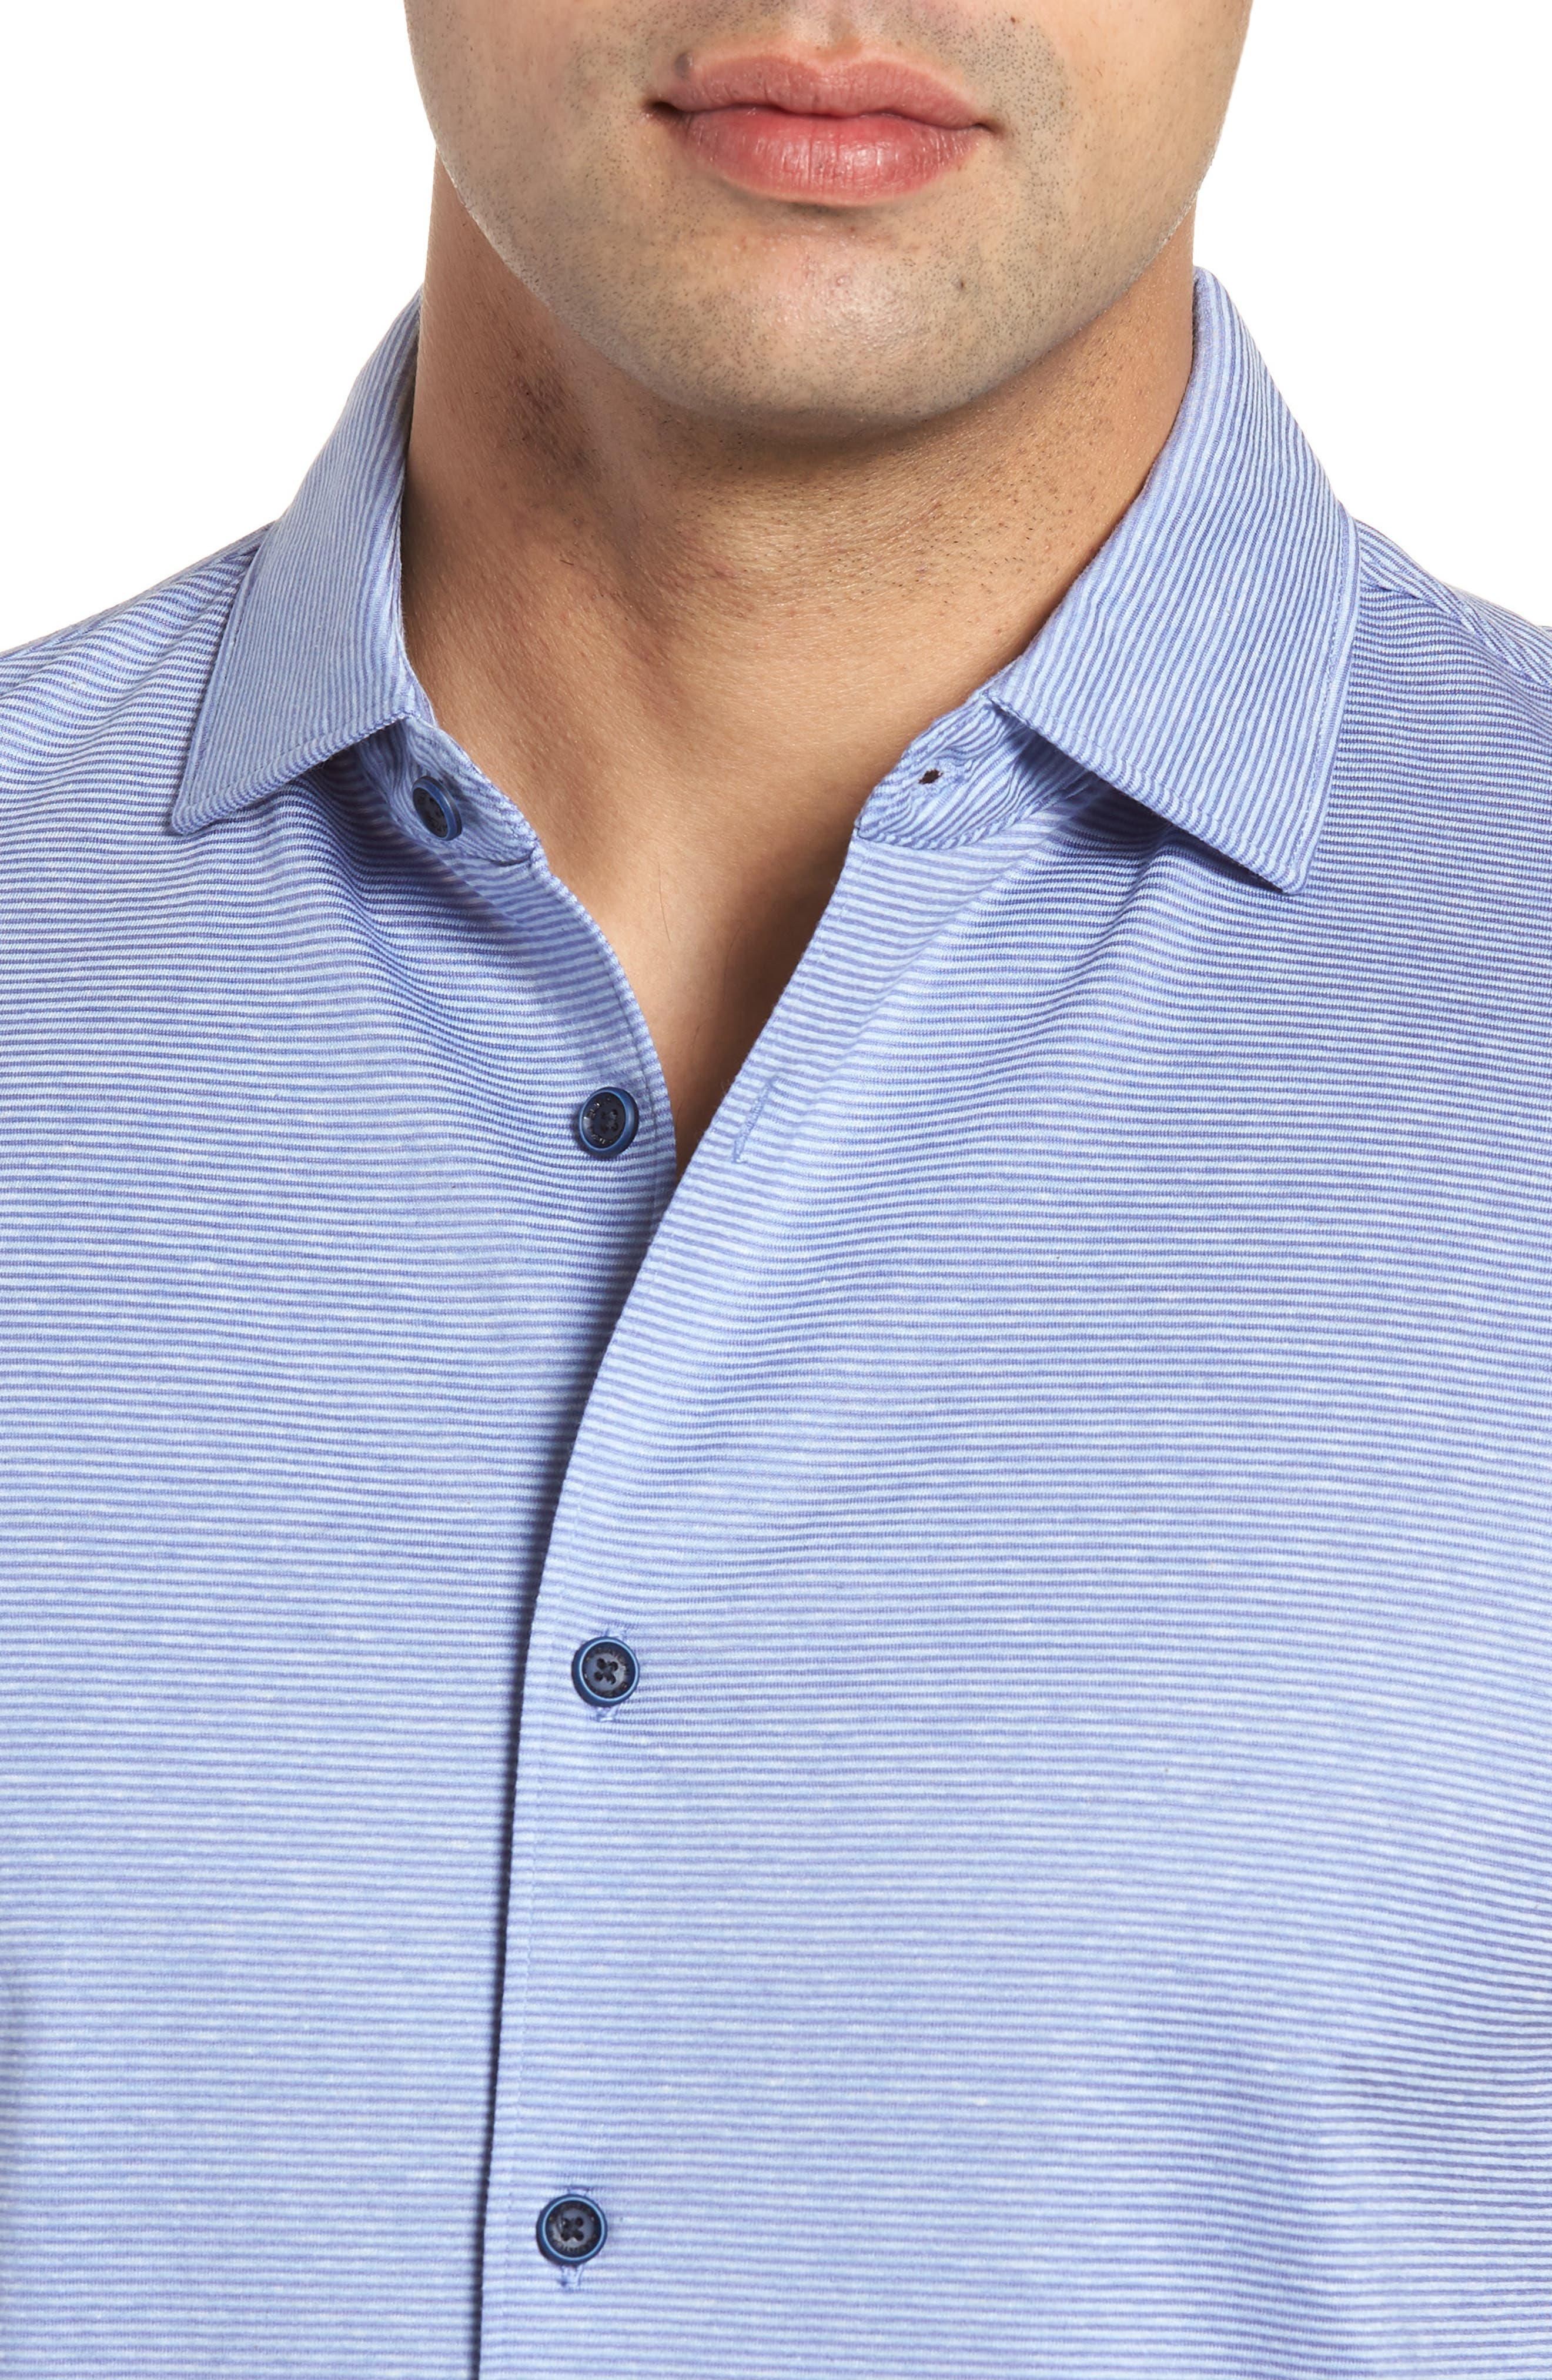 Regular Fit Knit Sport Shirt,                             Alternate thumbnail 4, color,                             511